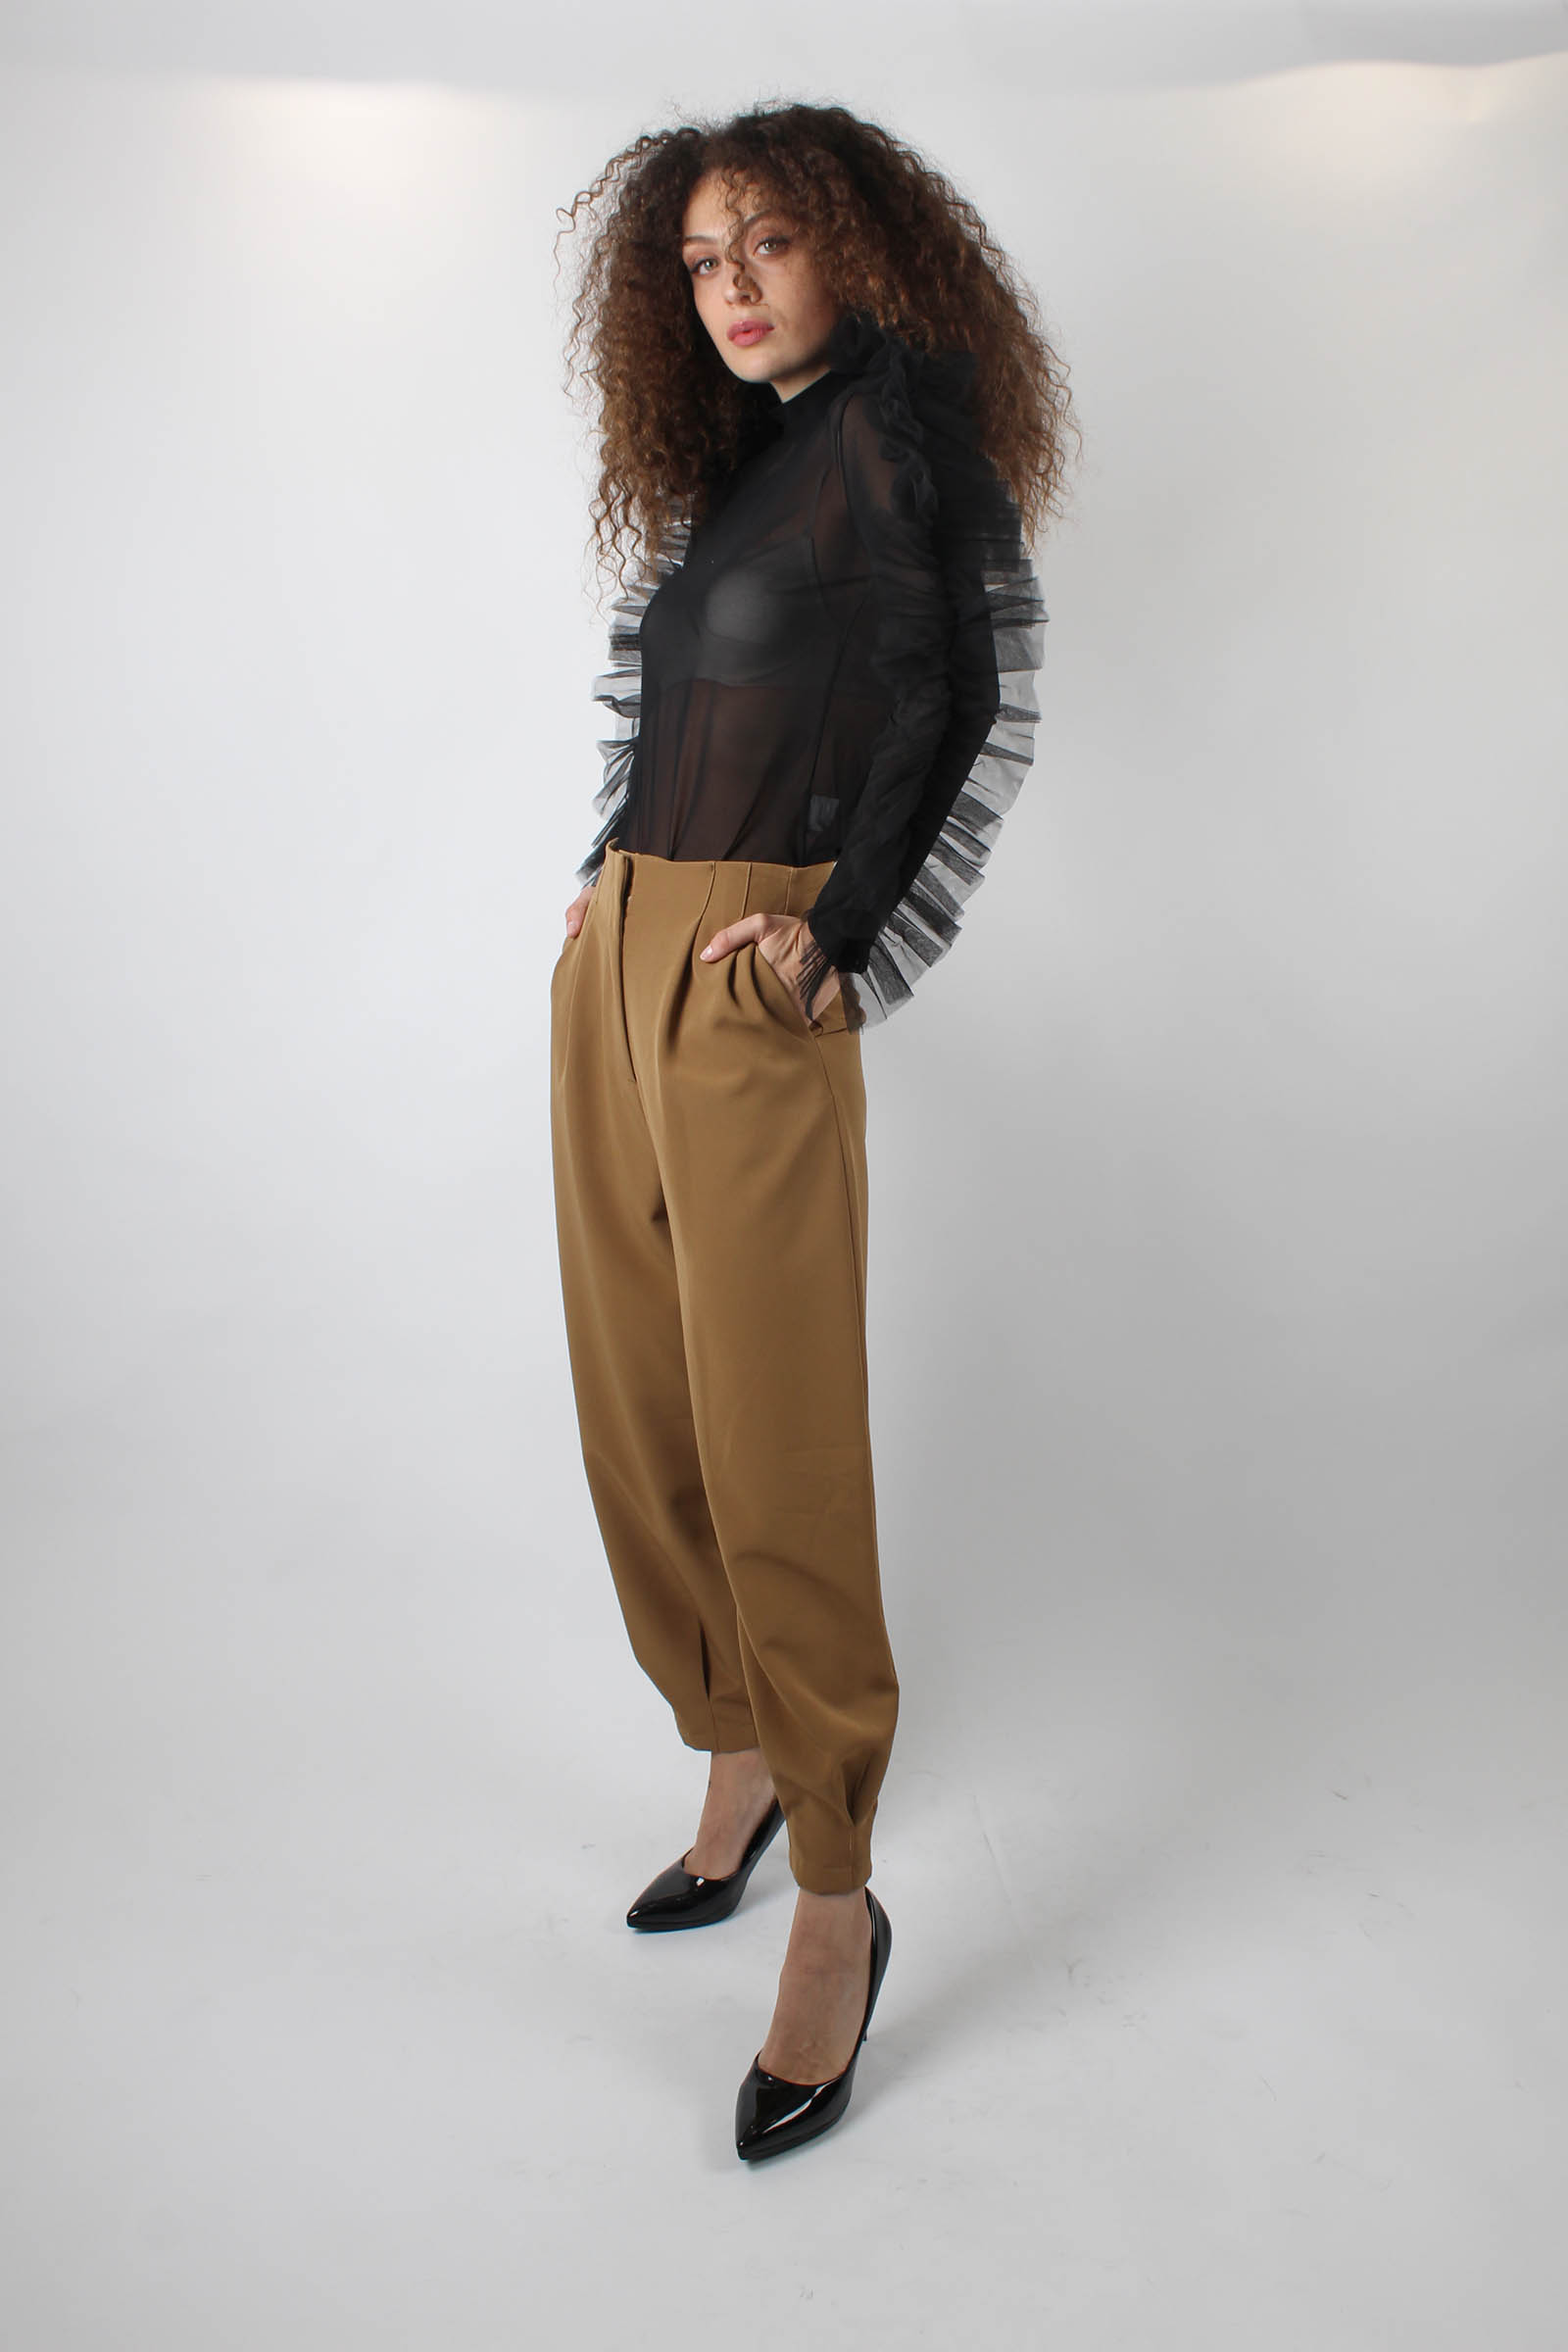 FANFRELUCHES   Shirt2   MAGLIA VELO1